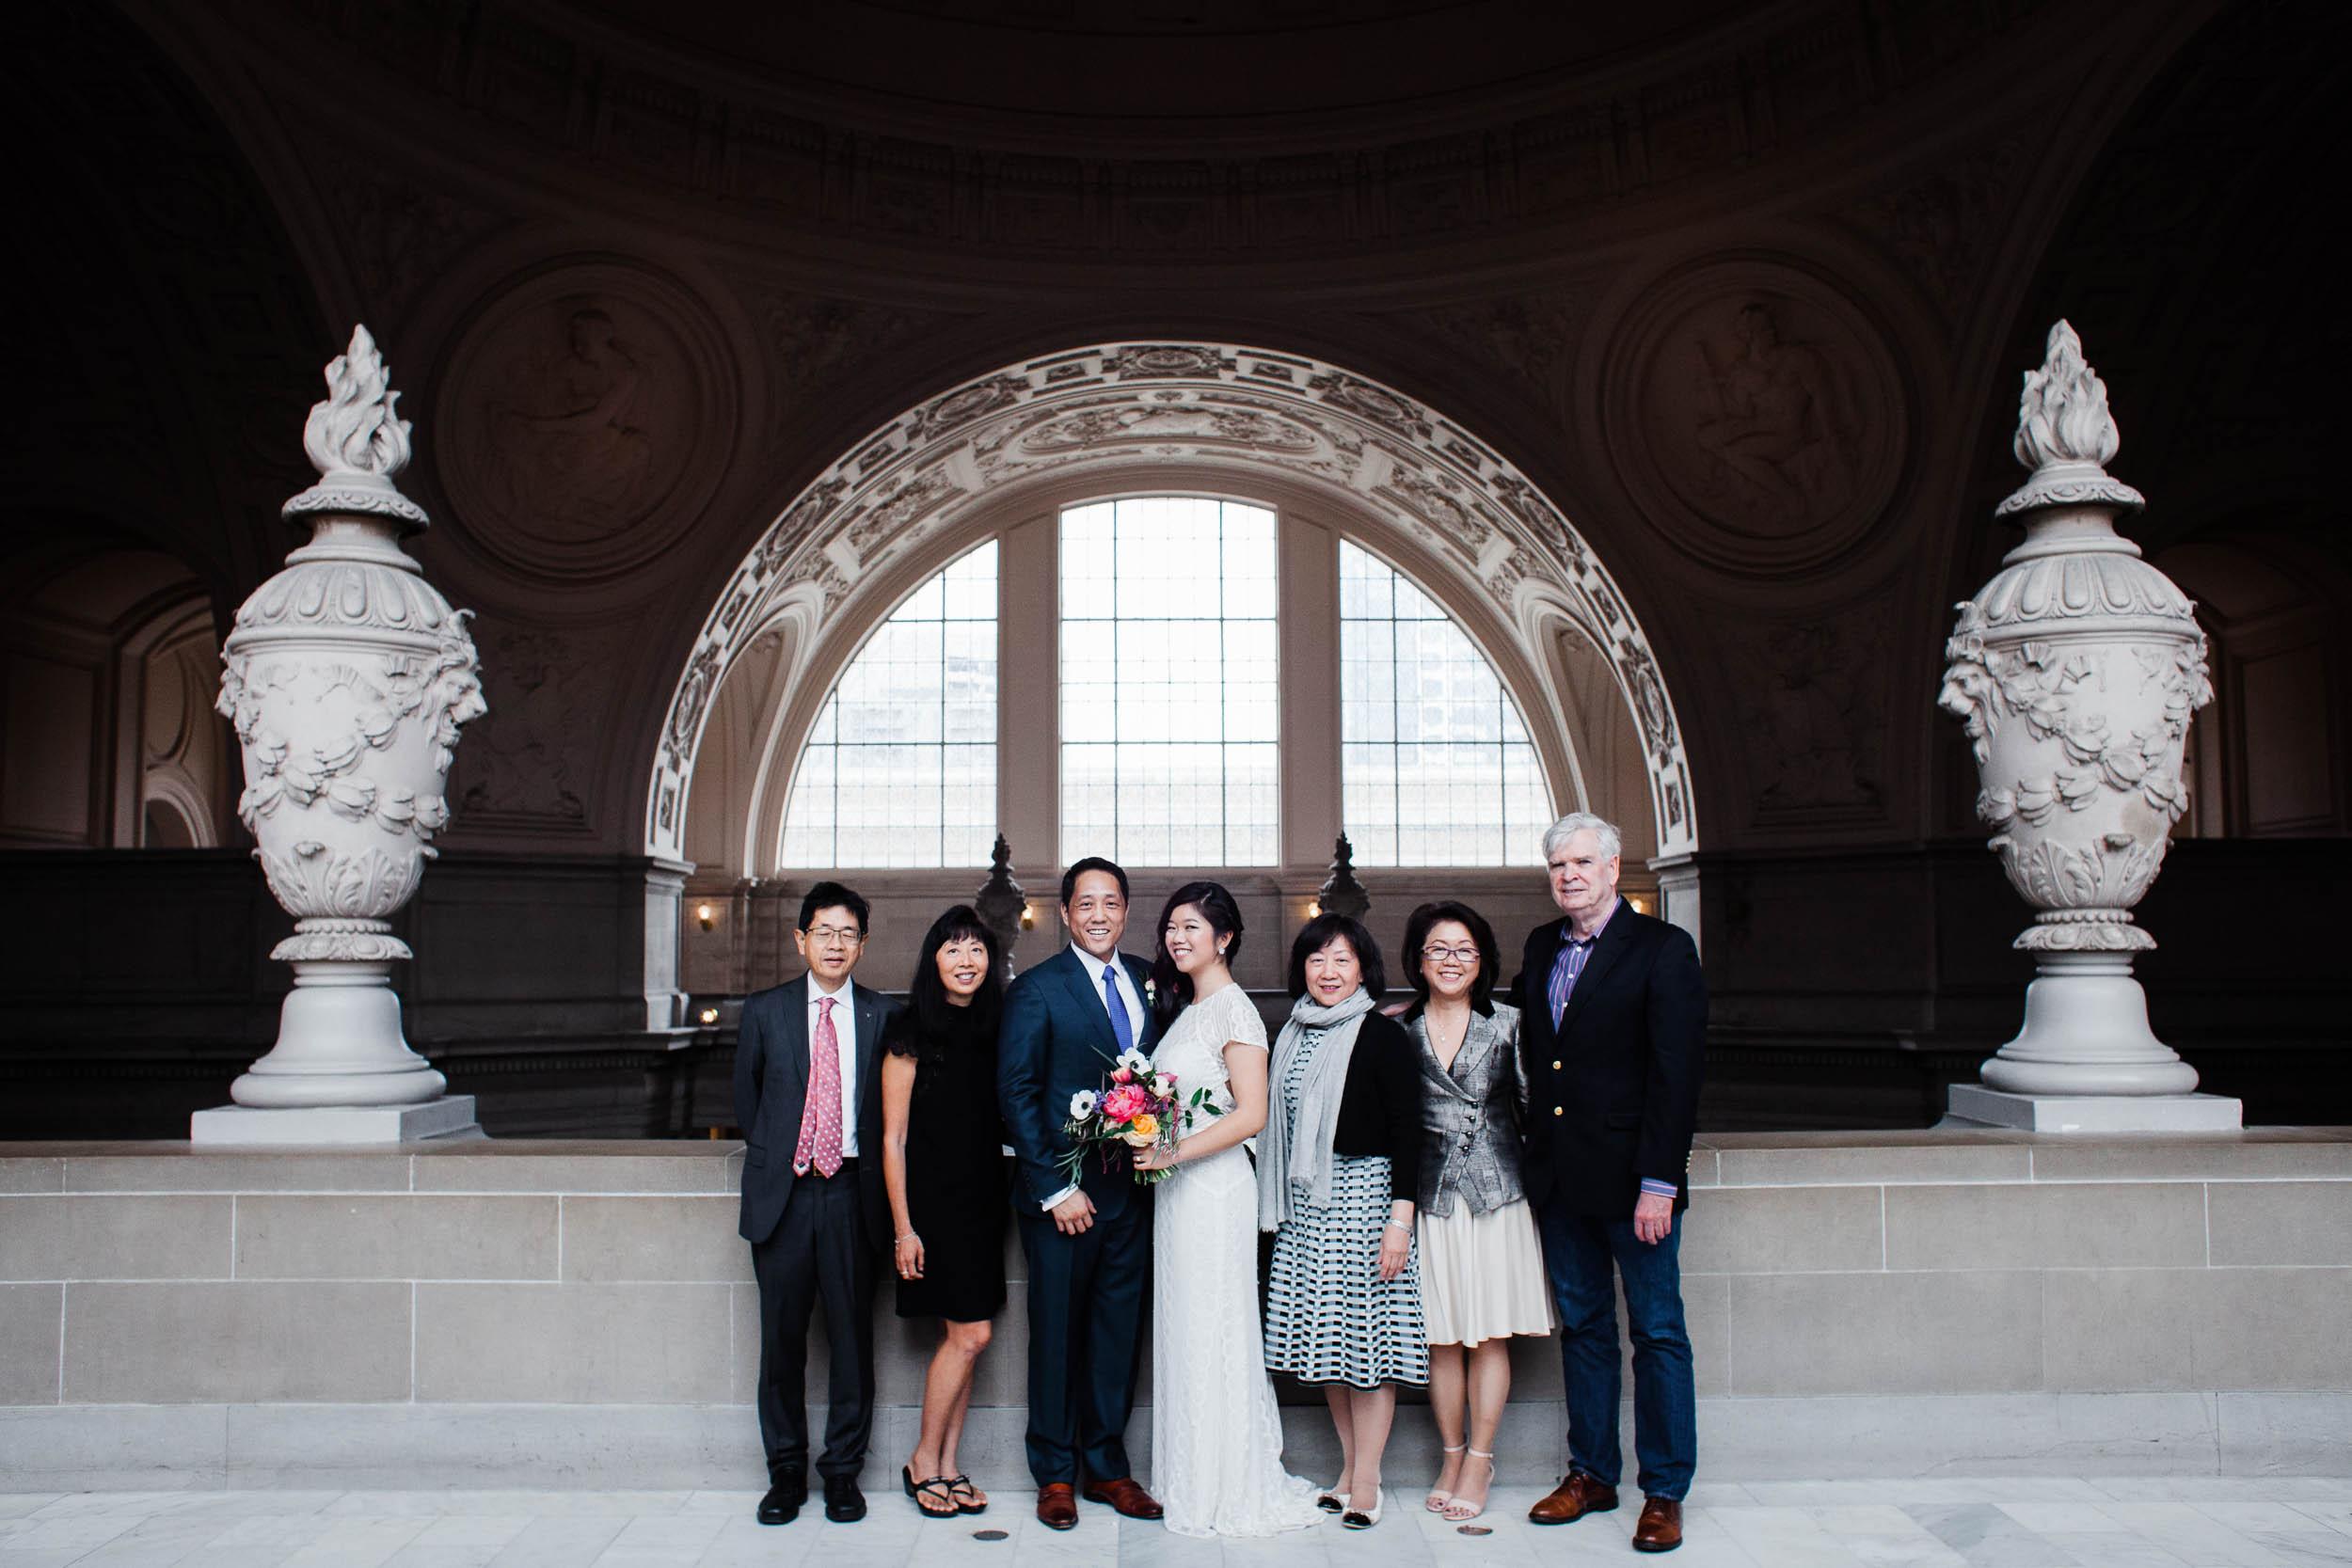 032118_M+D City Hall Wedding_Buena Lane Photography_0869.jpg